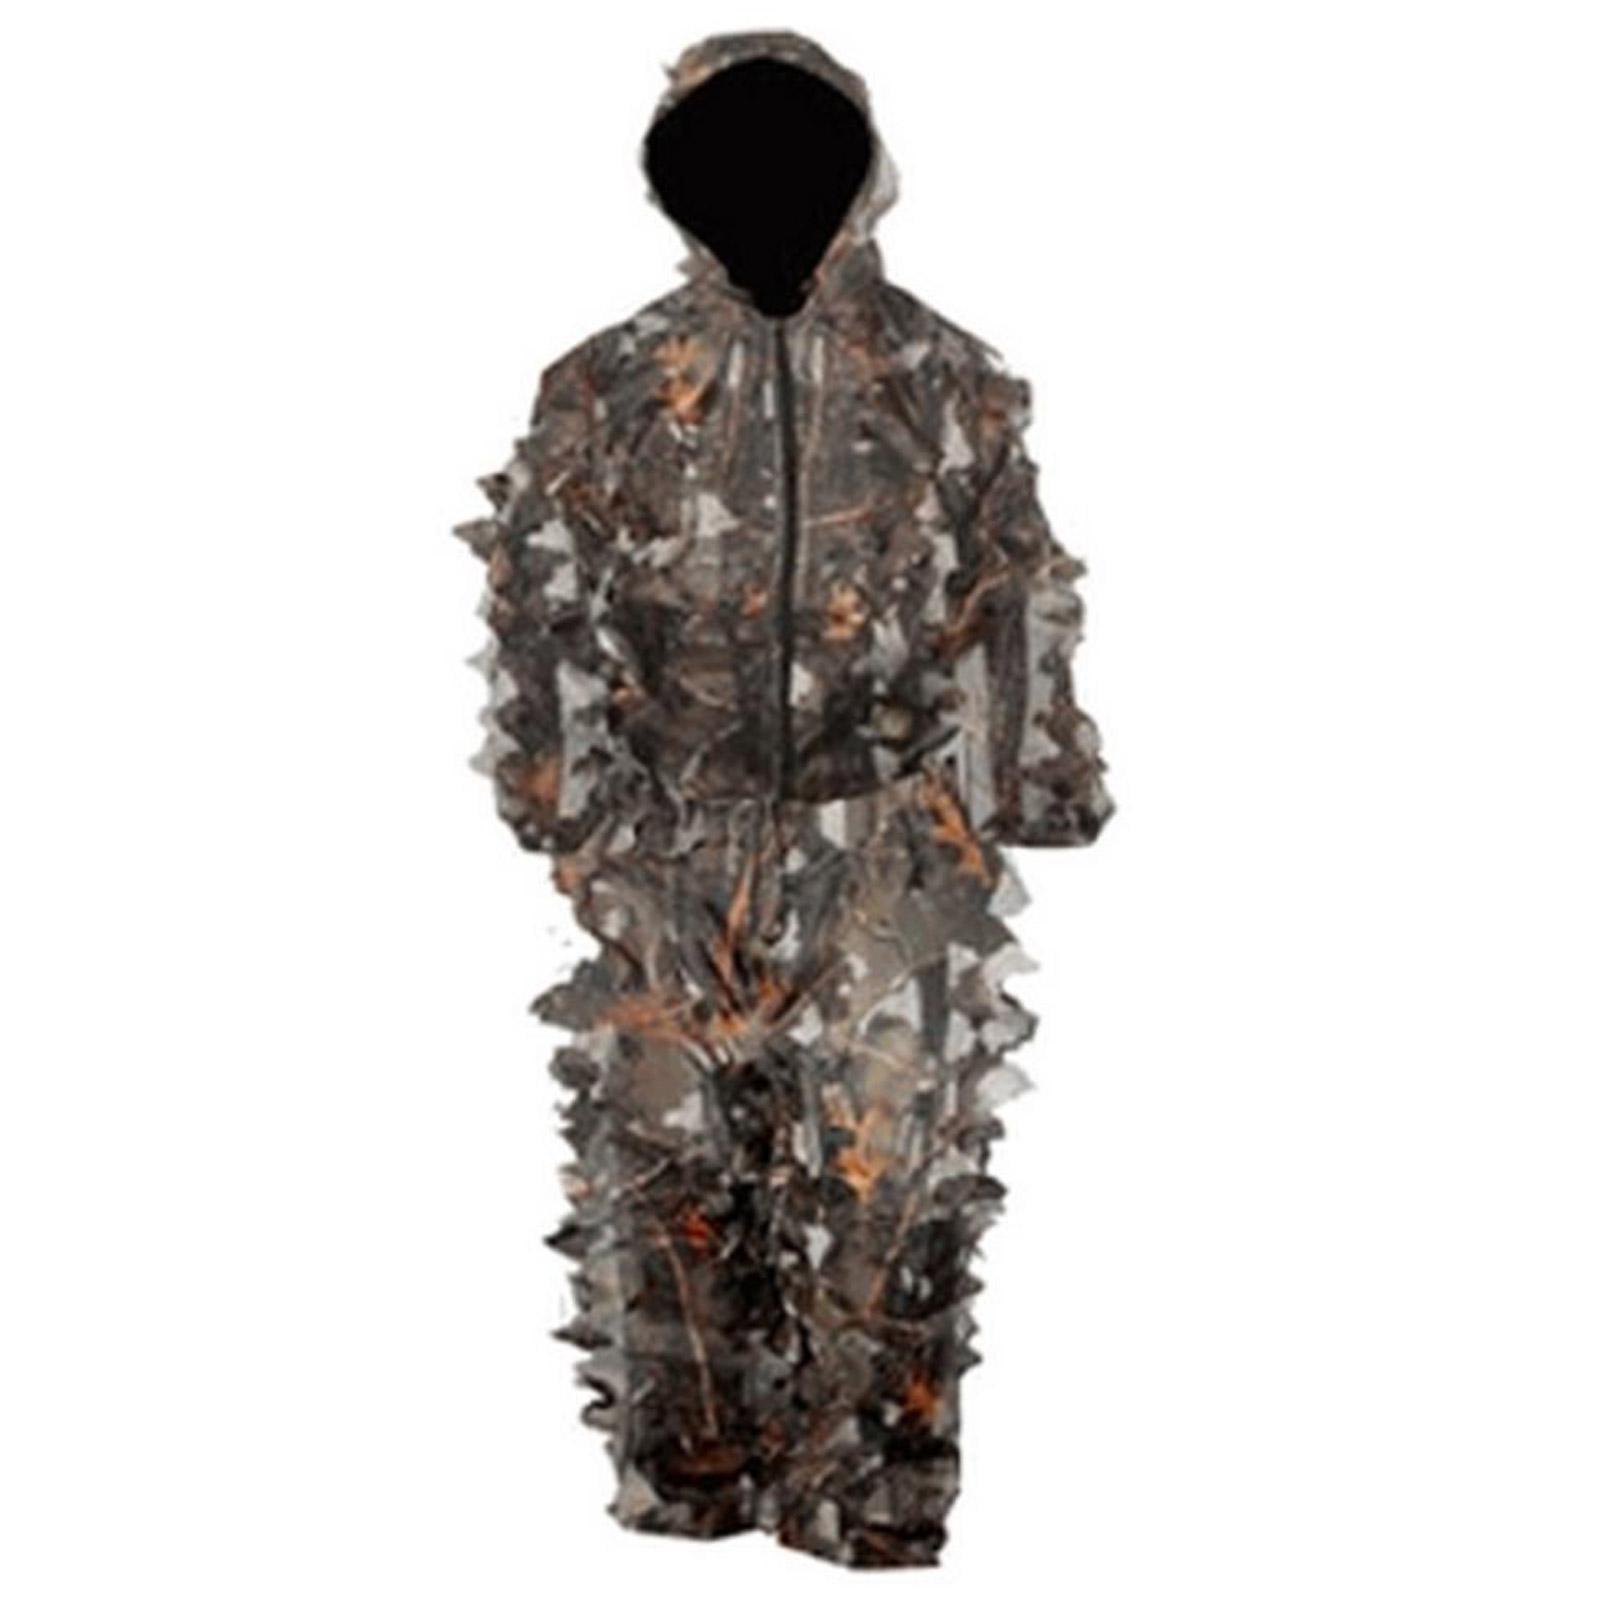 WFS MS400-401 Men's Burly Camo Bushwear Leafy Ghillie Suit by World Famous